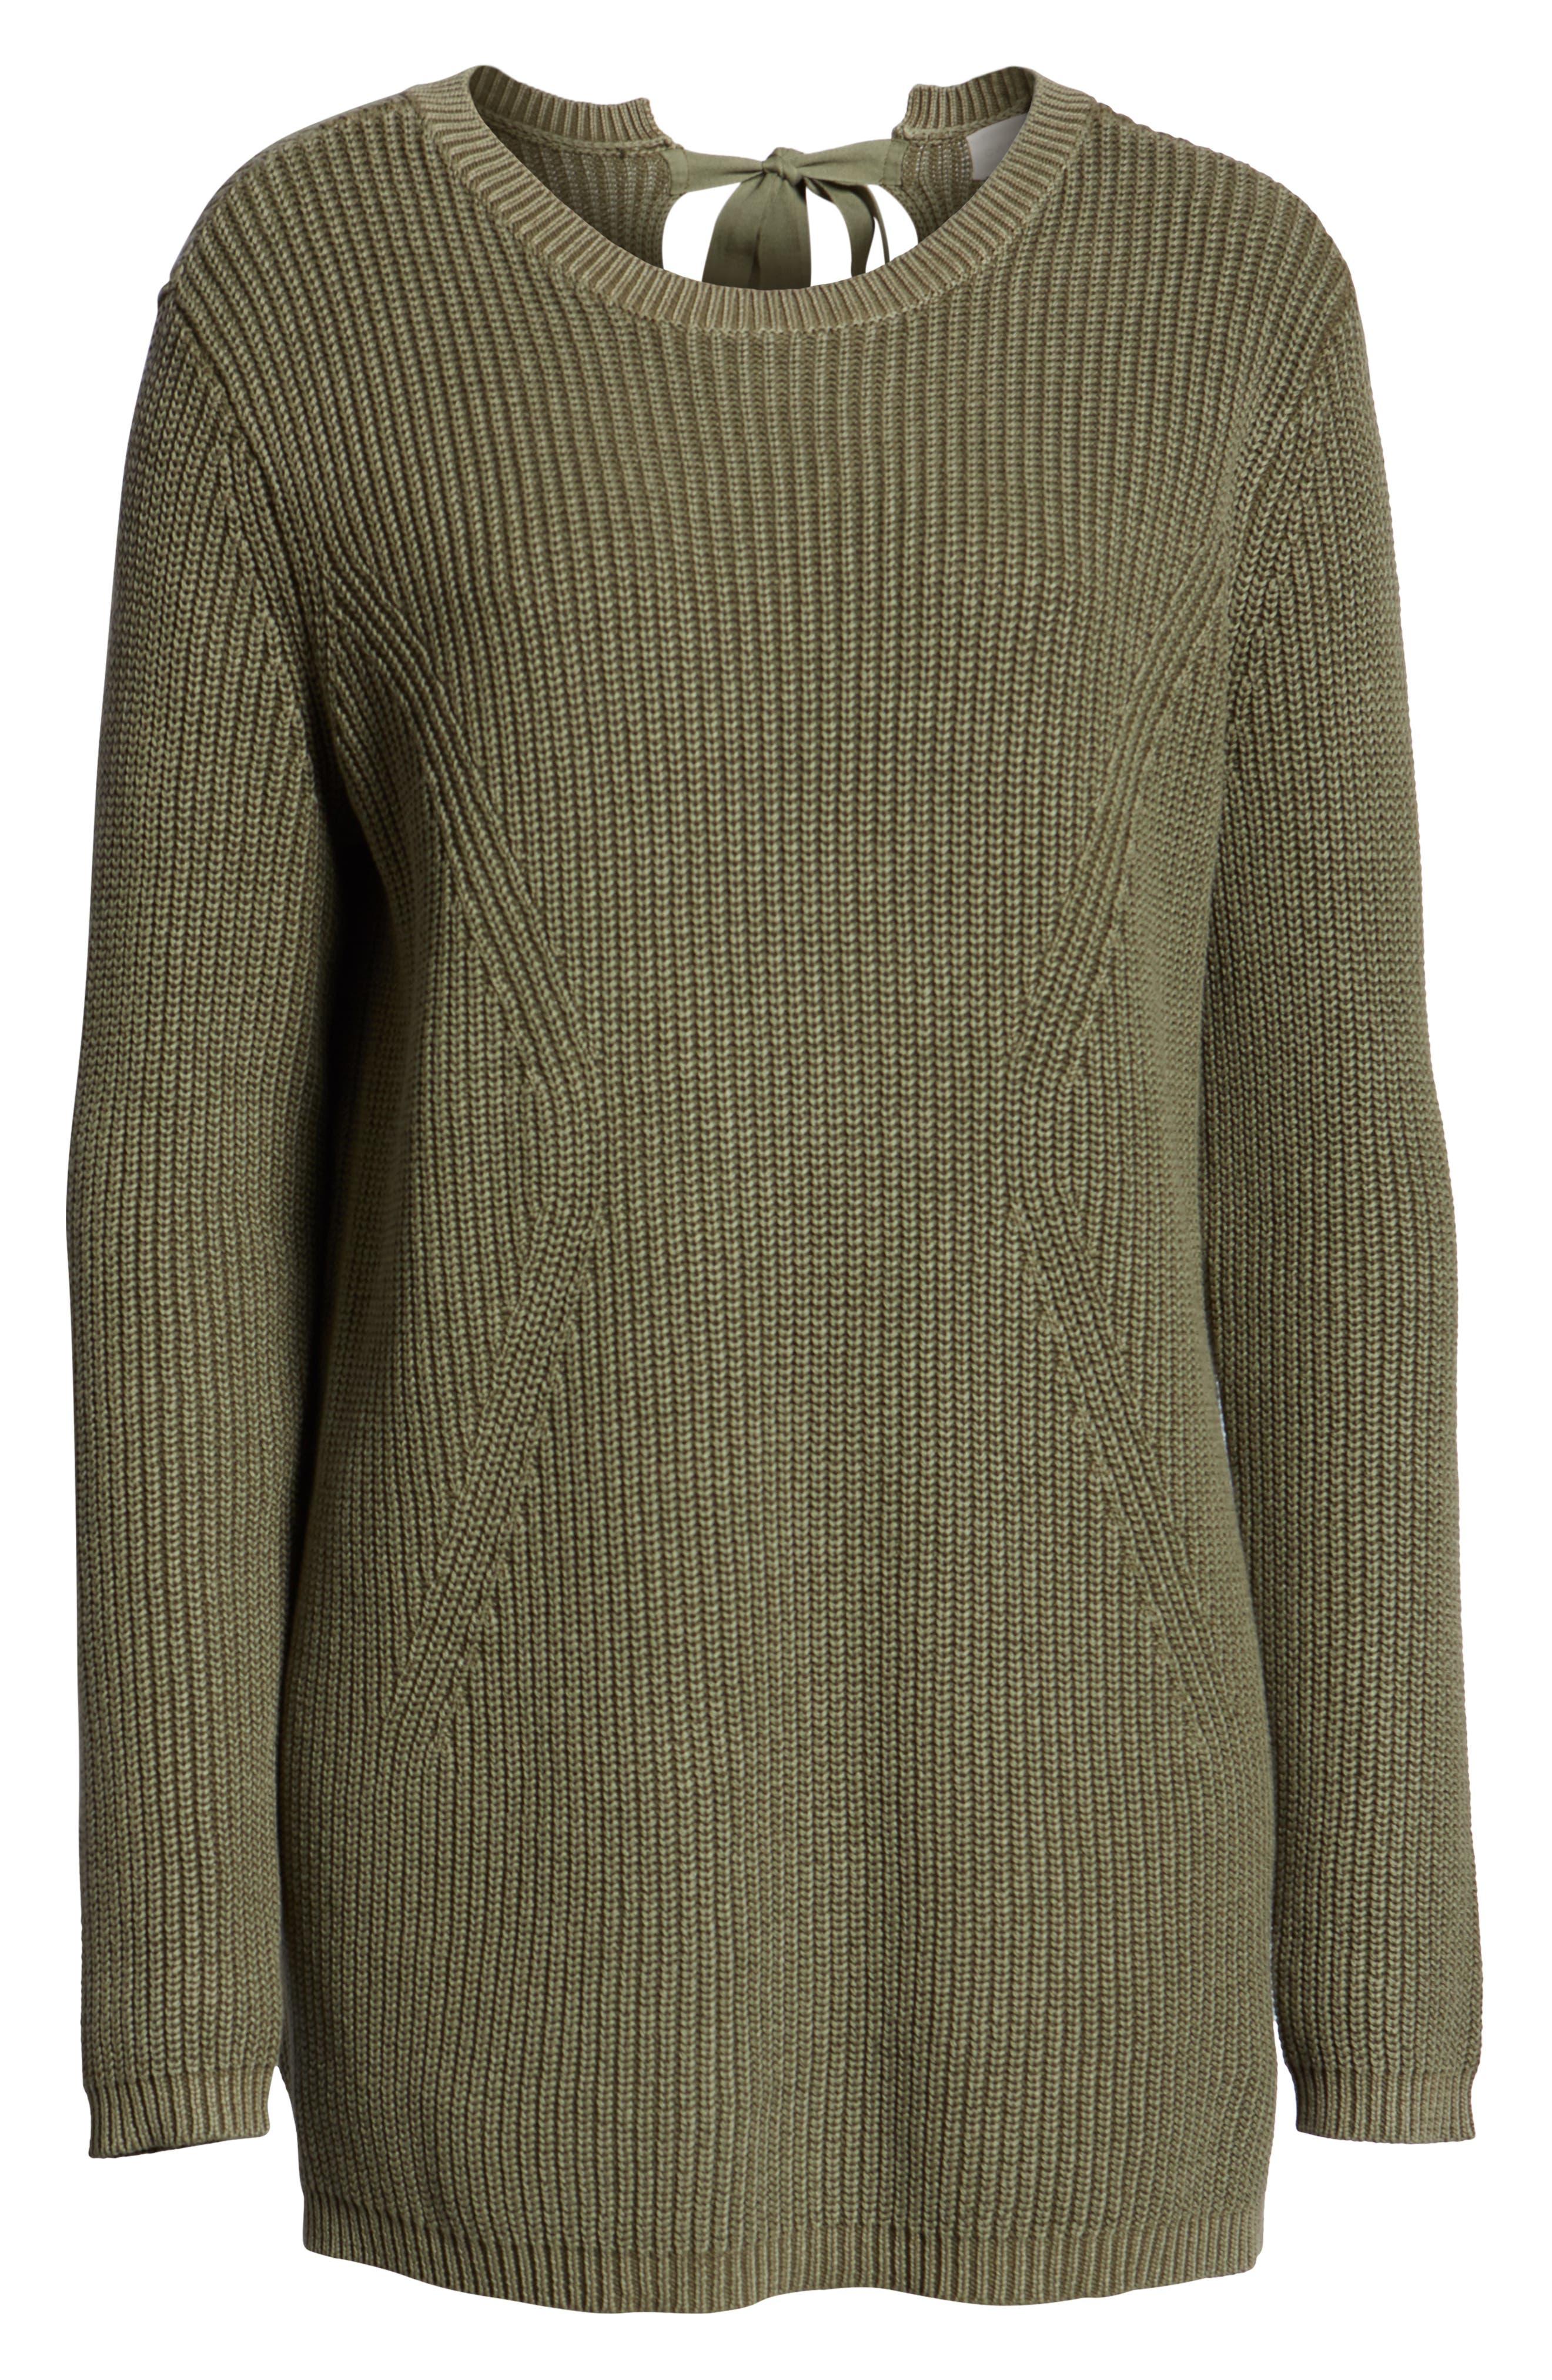 CASLON<SUP>®</SUP>, Tie Back Tunic Sweater, Alternate thumbnail 6, color, OLIVE SARMA